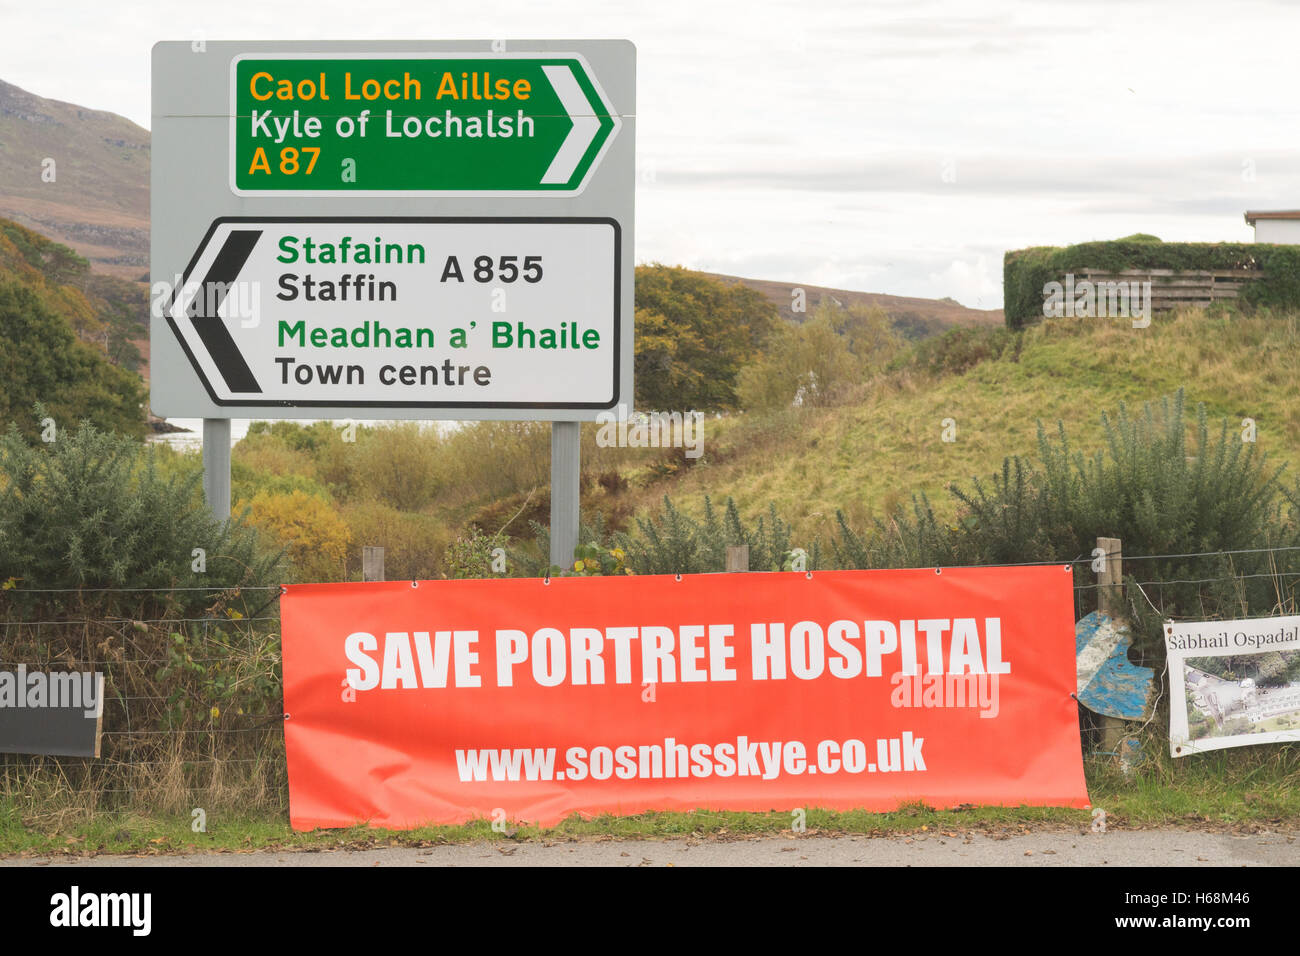 Guardar Hospital Portree banner, Isla de Skye, Escocia, Reino Unido Imagen De Stock